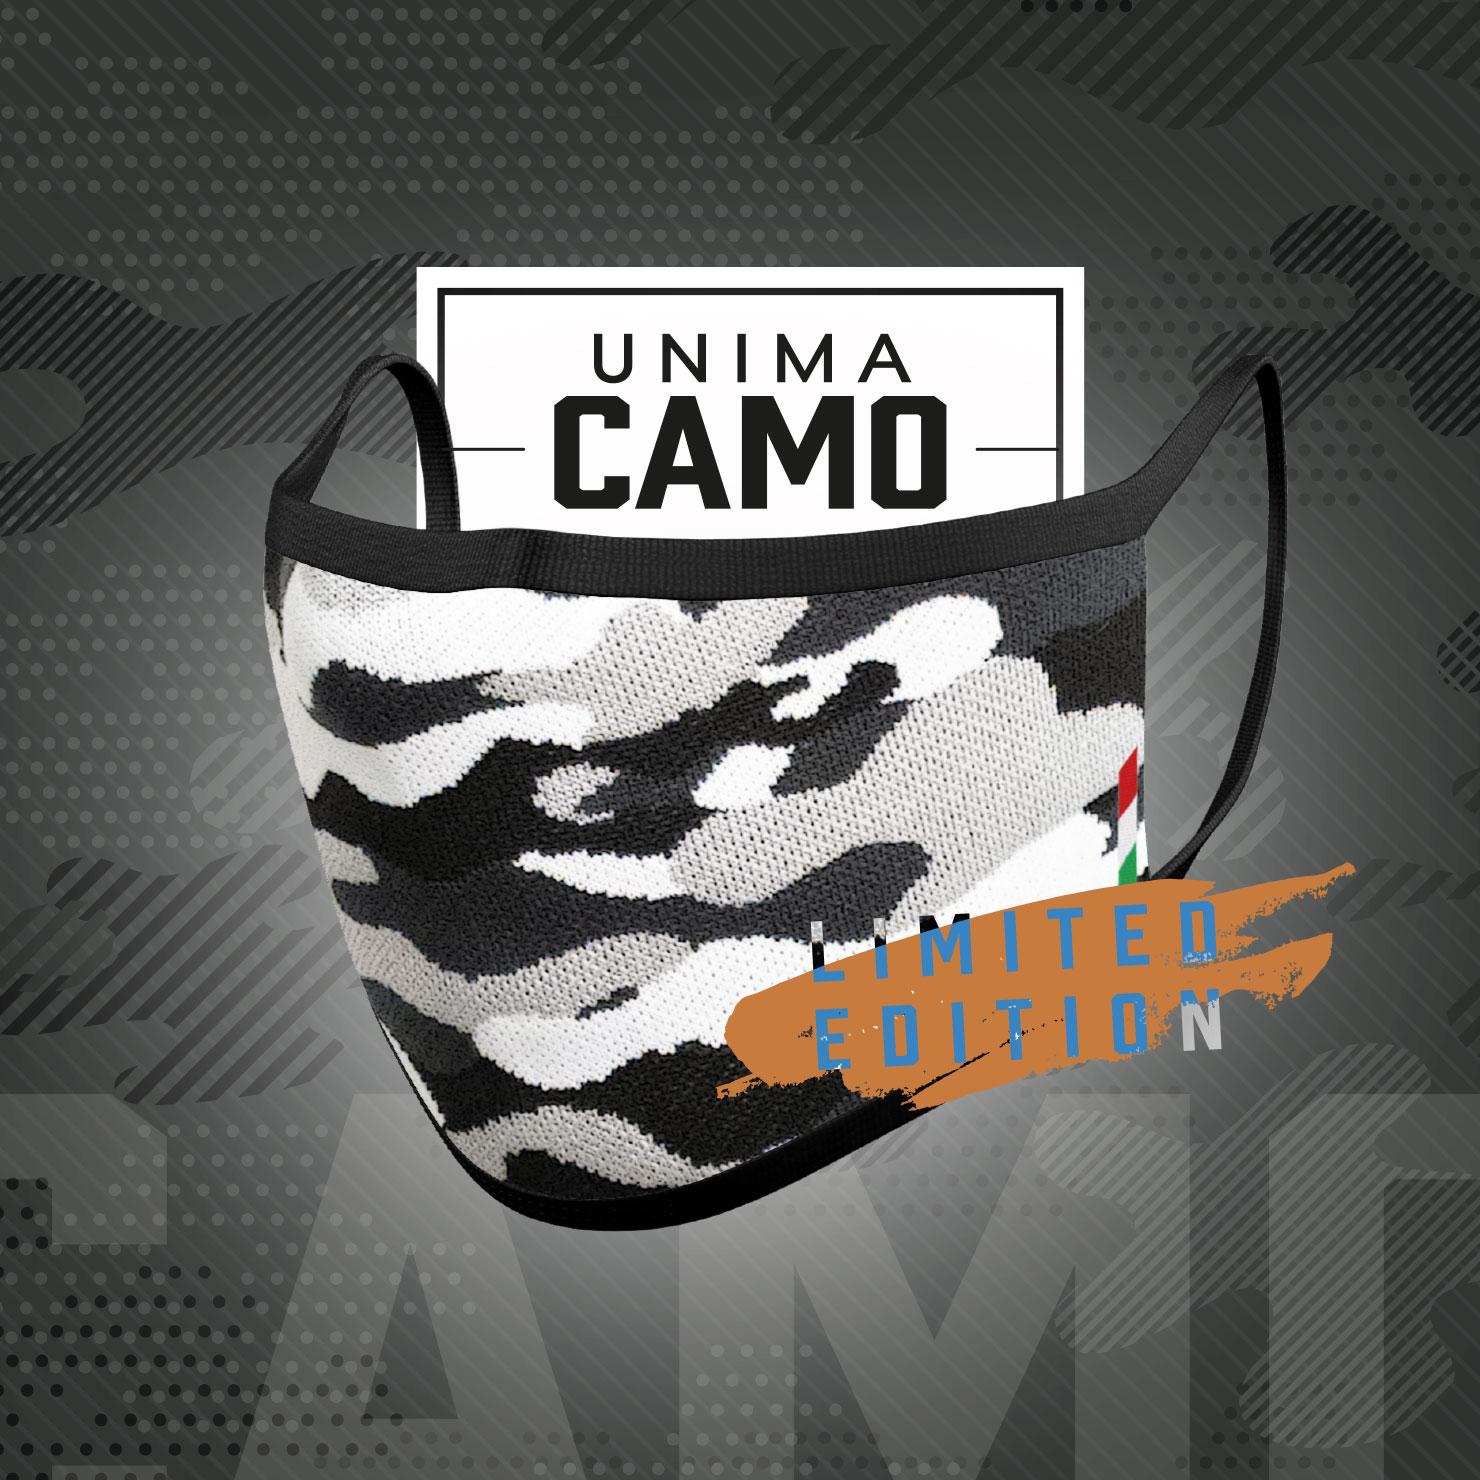 2021-02-17_UNIMA-CAMO